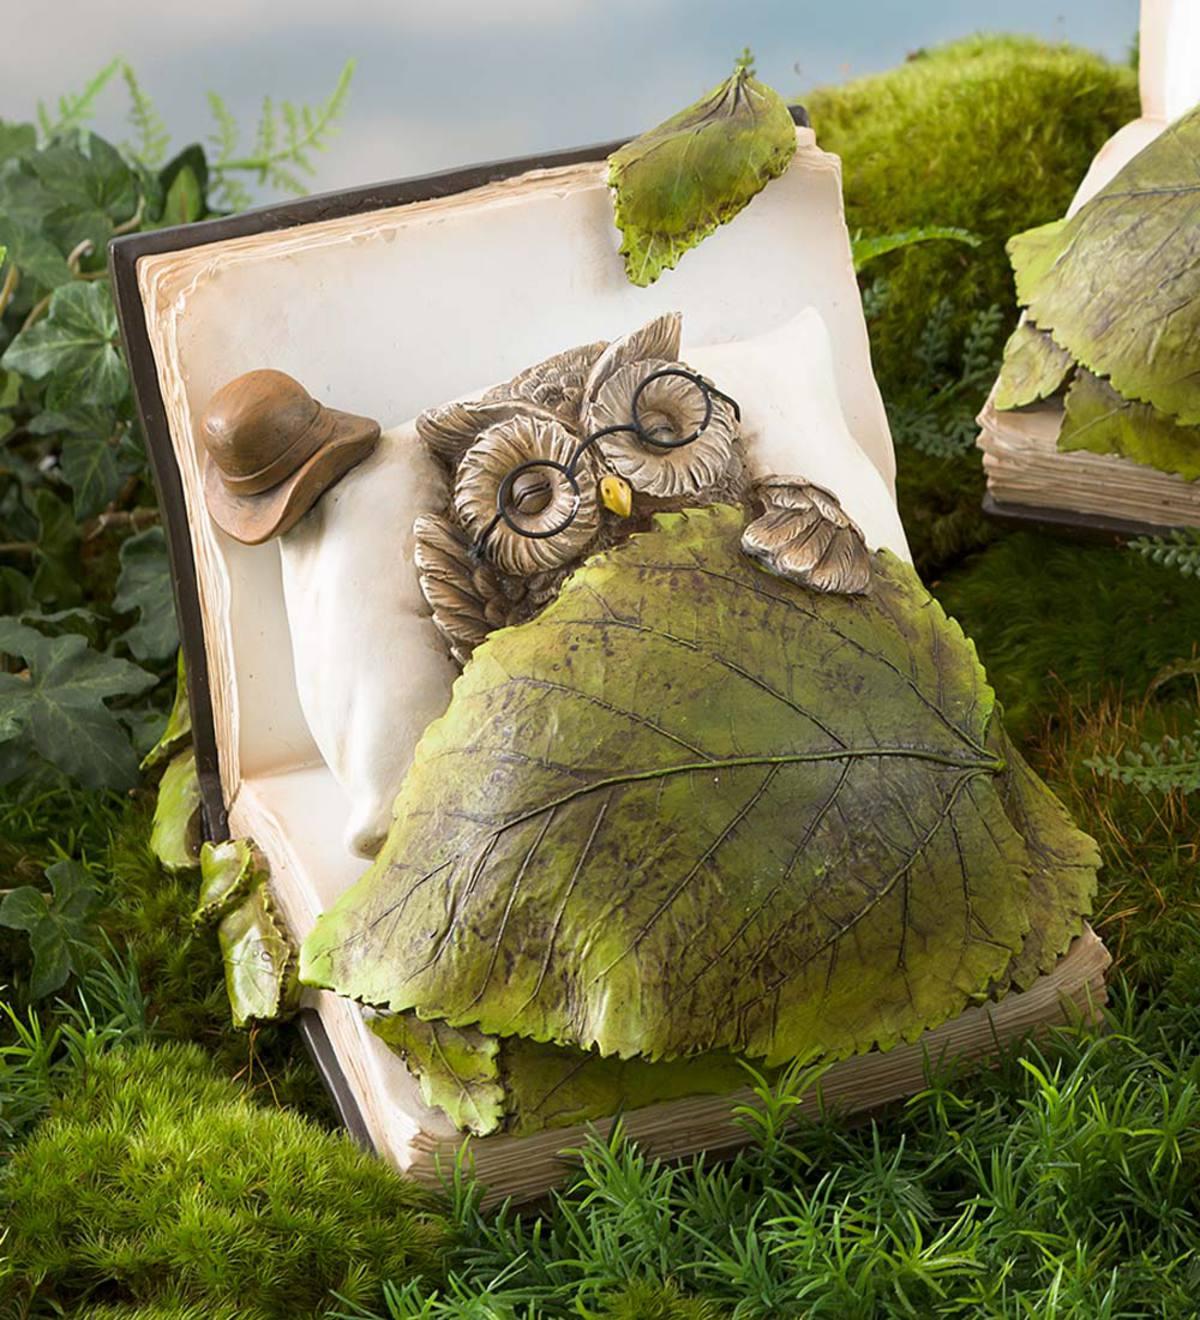 Book Dreamer Sleeping Animal Garden Statue Frog Plowhearth